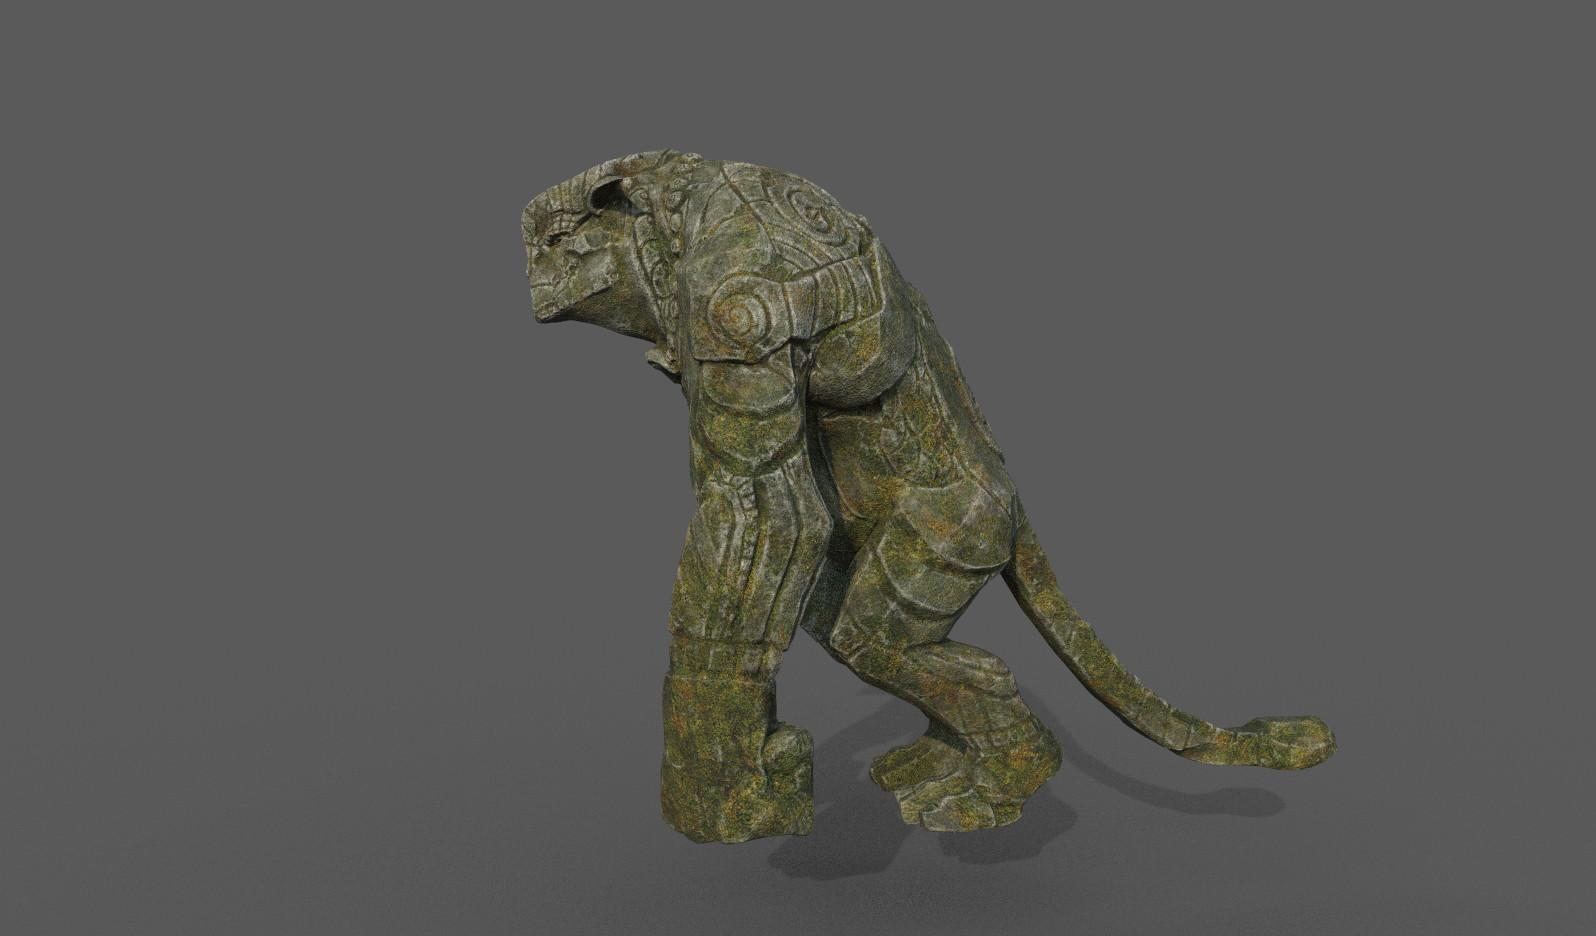 Darko mitev beast statuev2 01